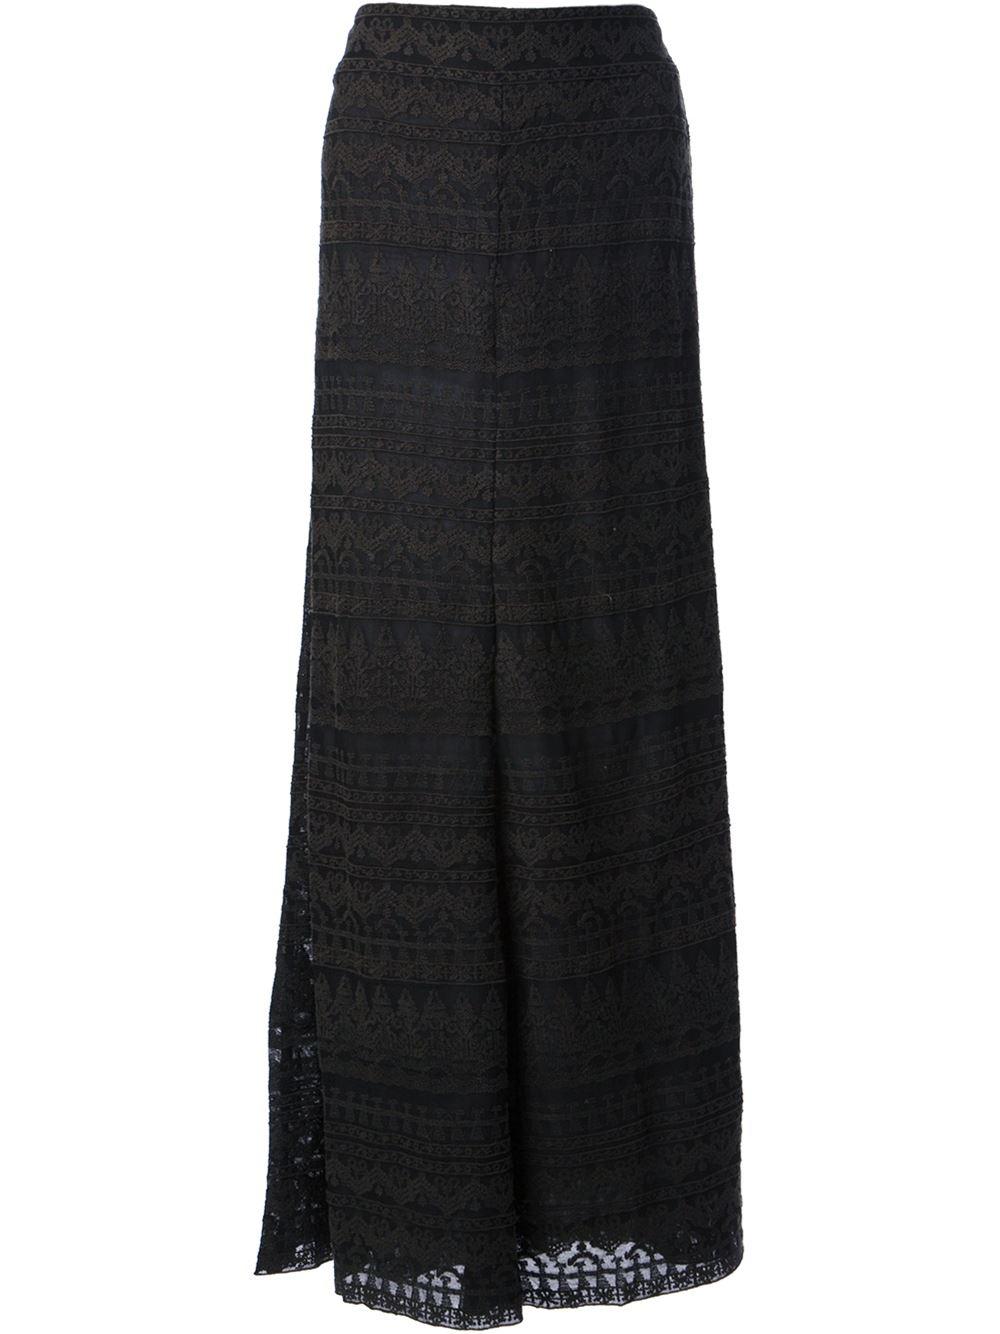 Isabel Marant 'tory' Jacquard Skirt - Gente Roma - Farfetch.com